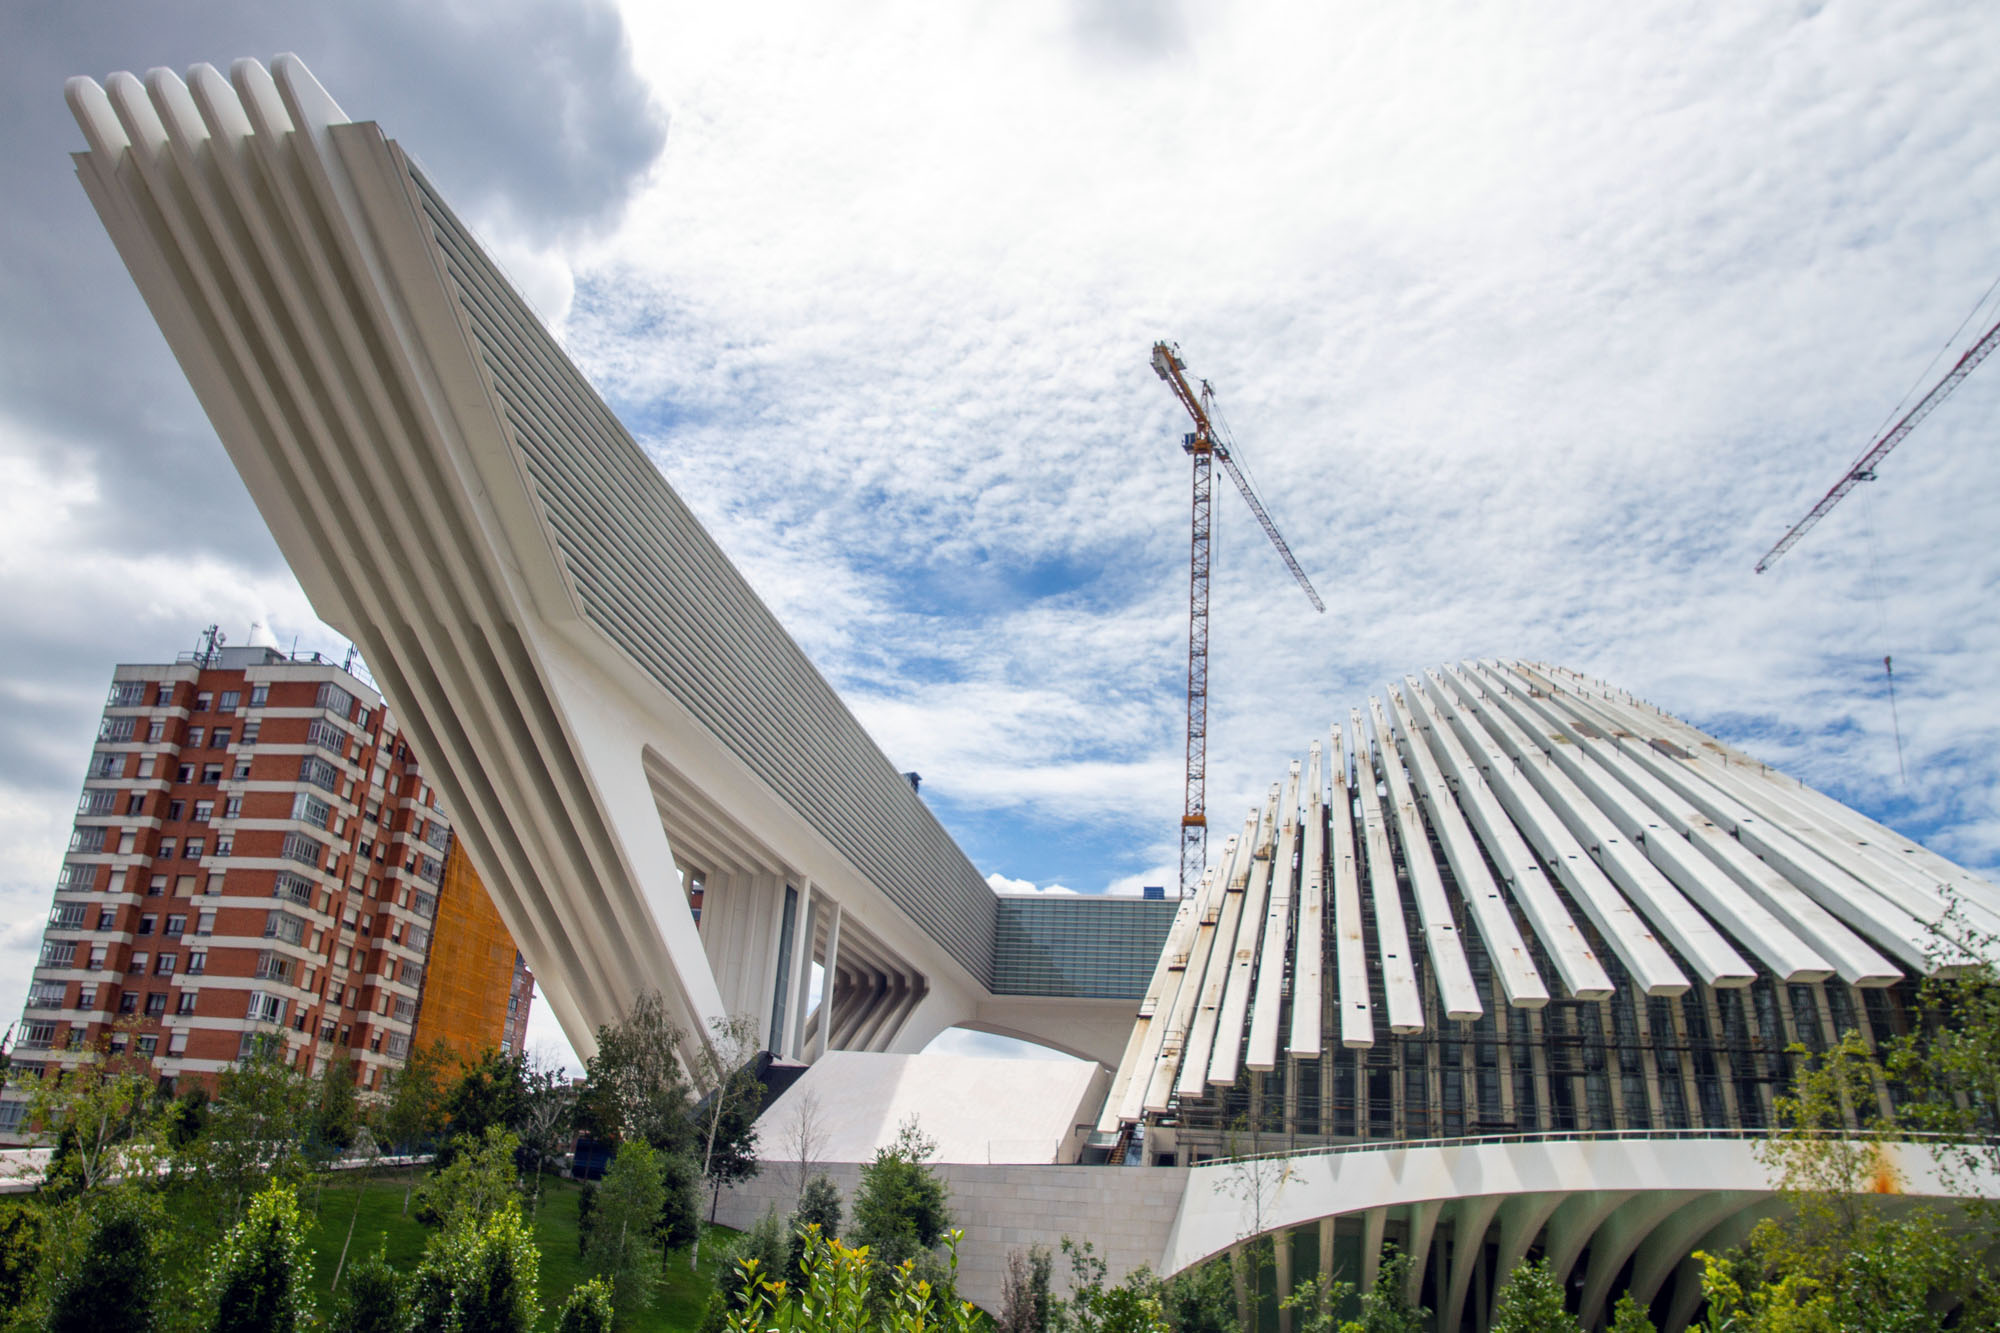 Construction Calatrava Palacio Congreso Oviedo